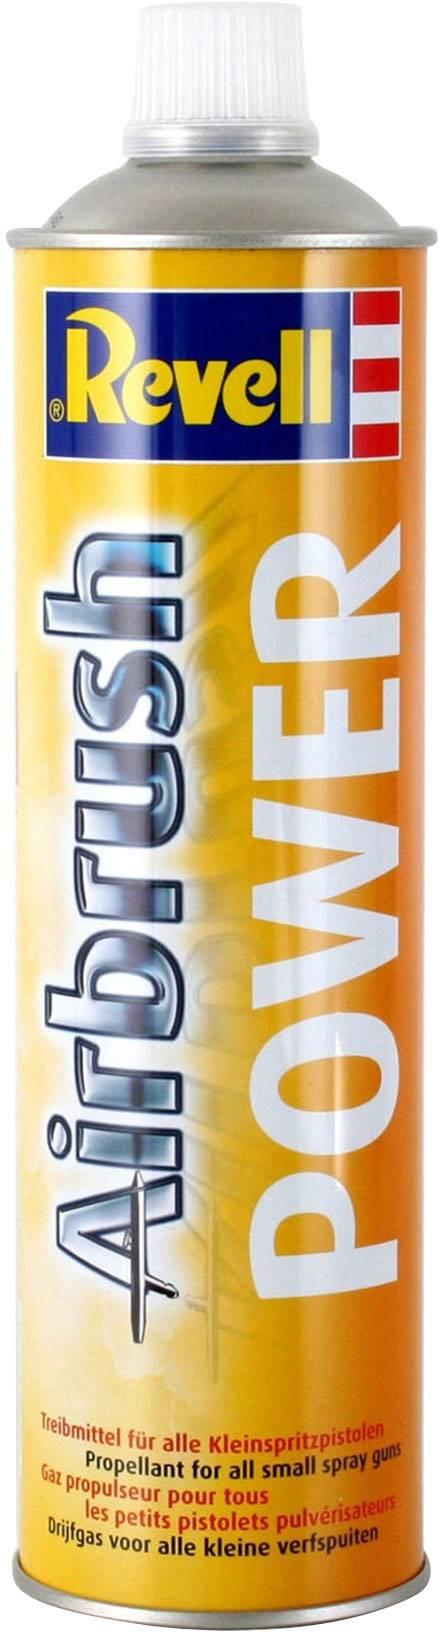 Aitbrush tlaková láhev Revell,750 ml